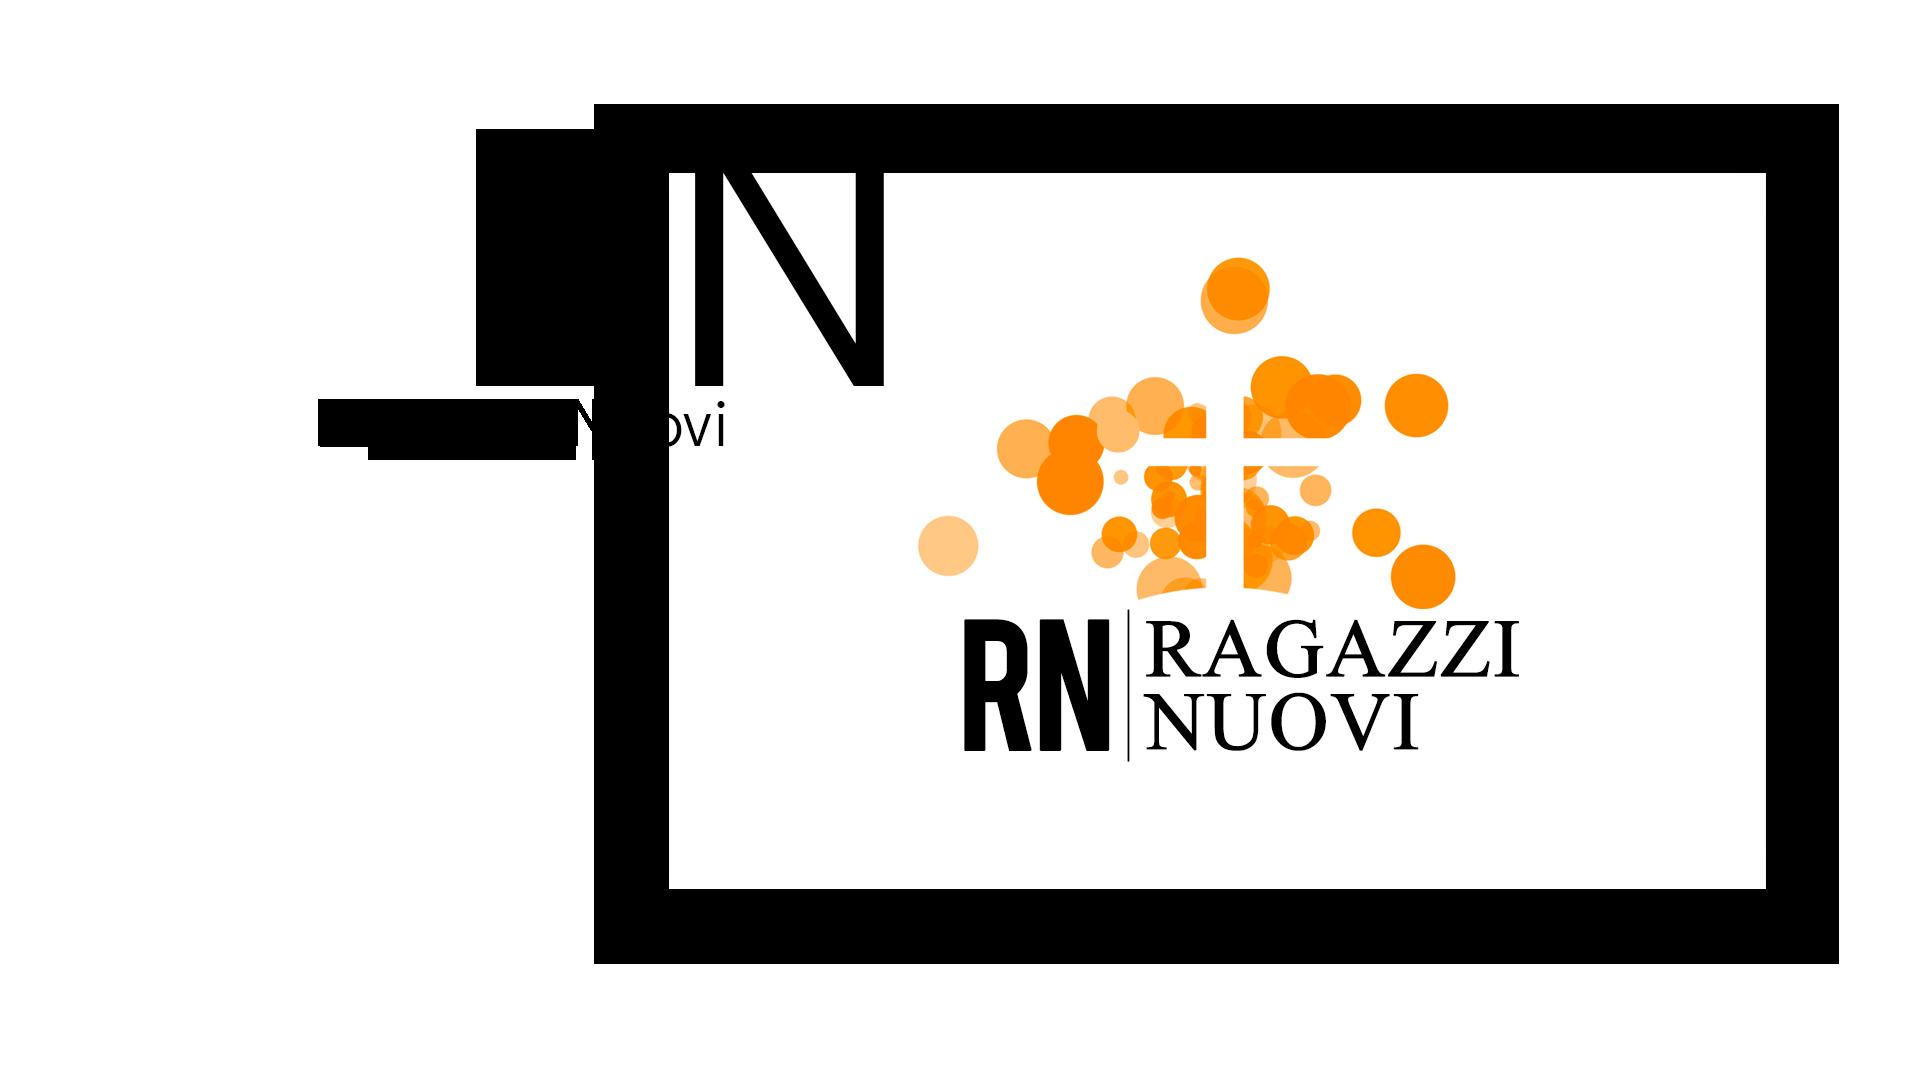 RN Ragazzi Nuovi